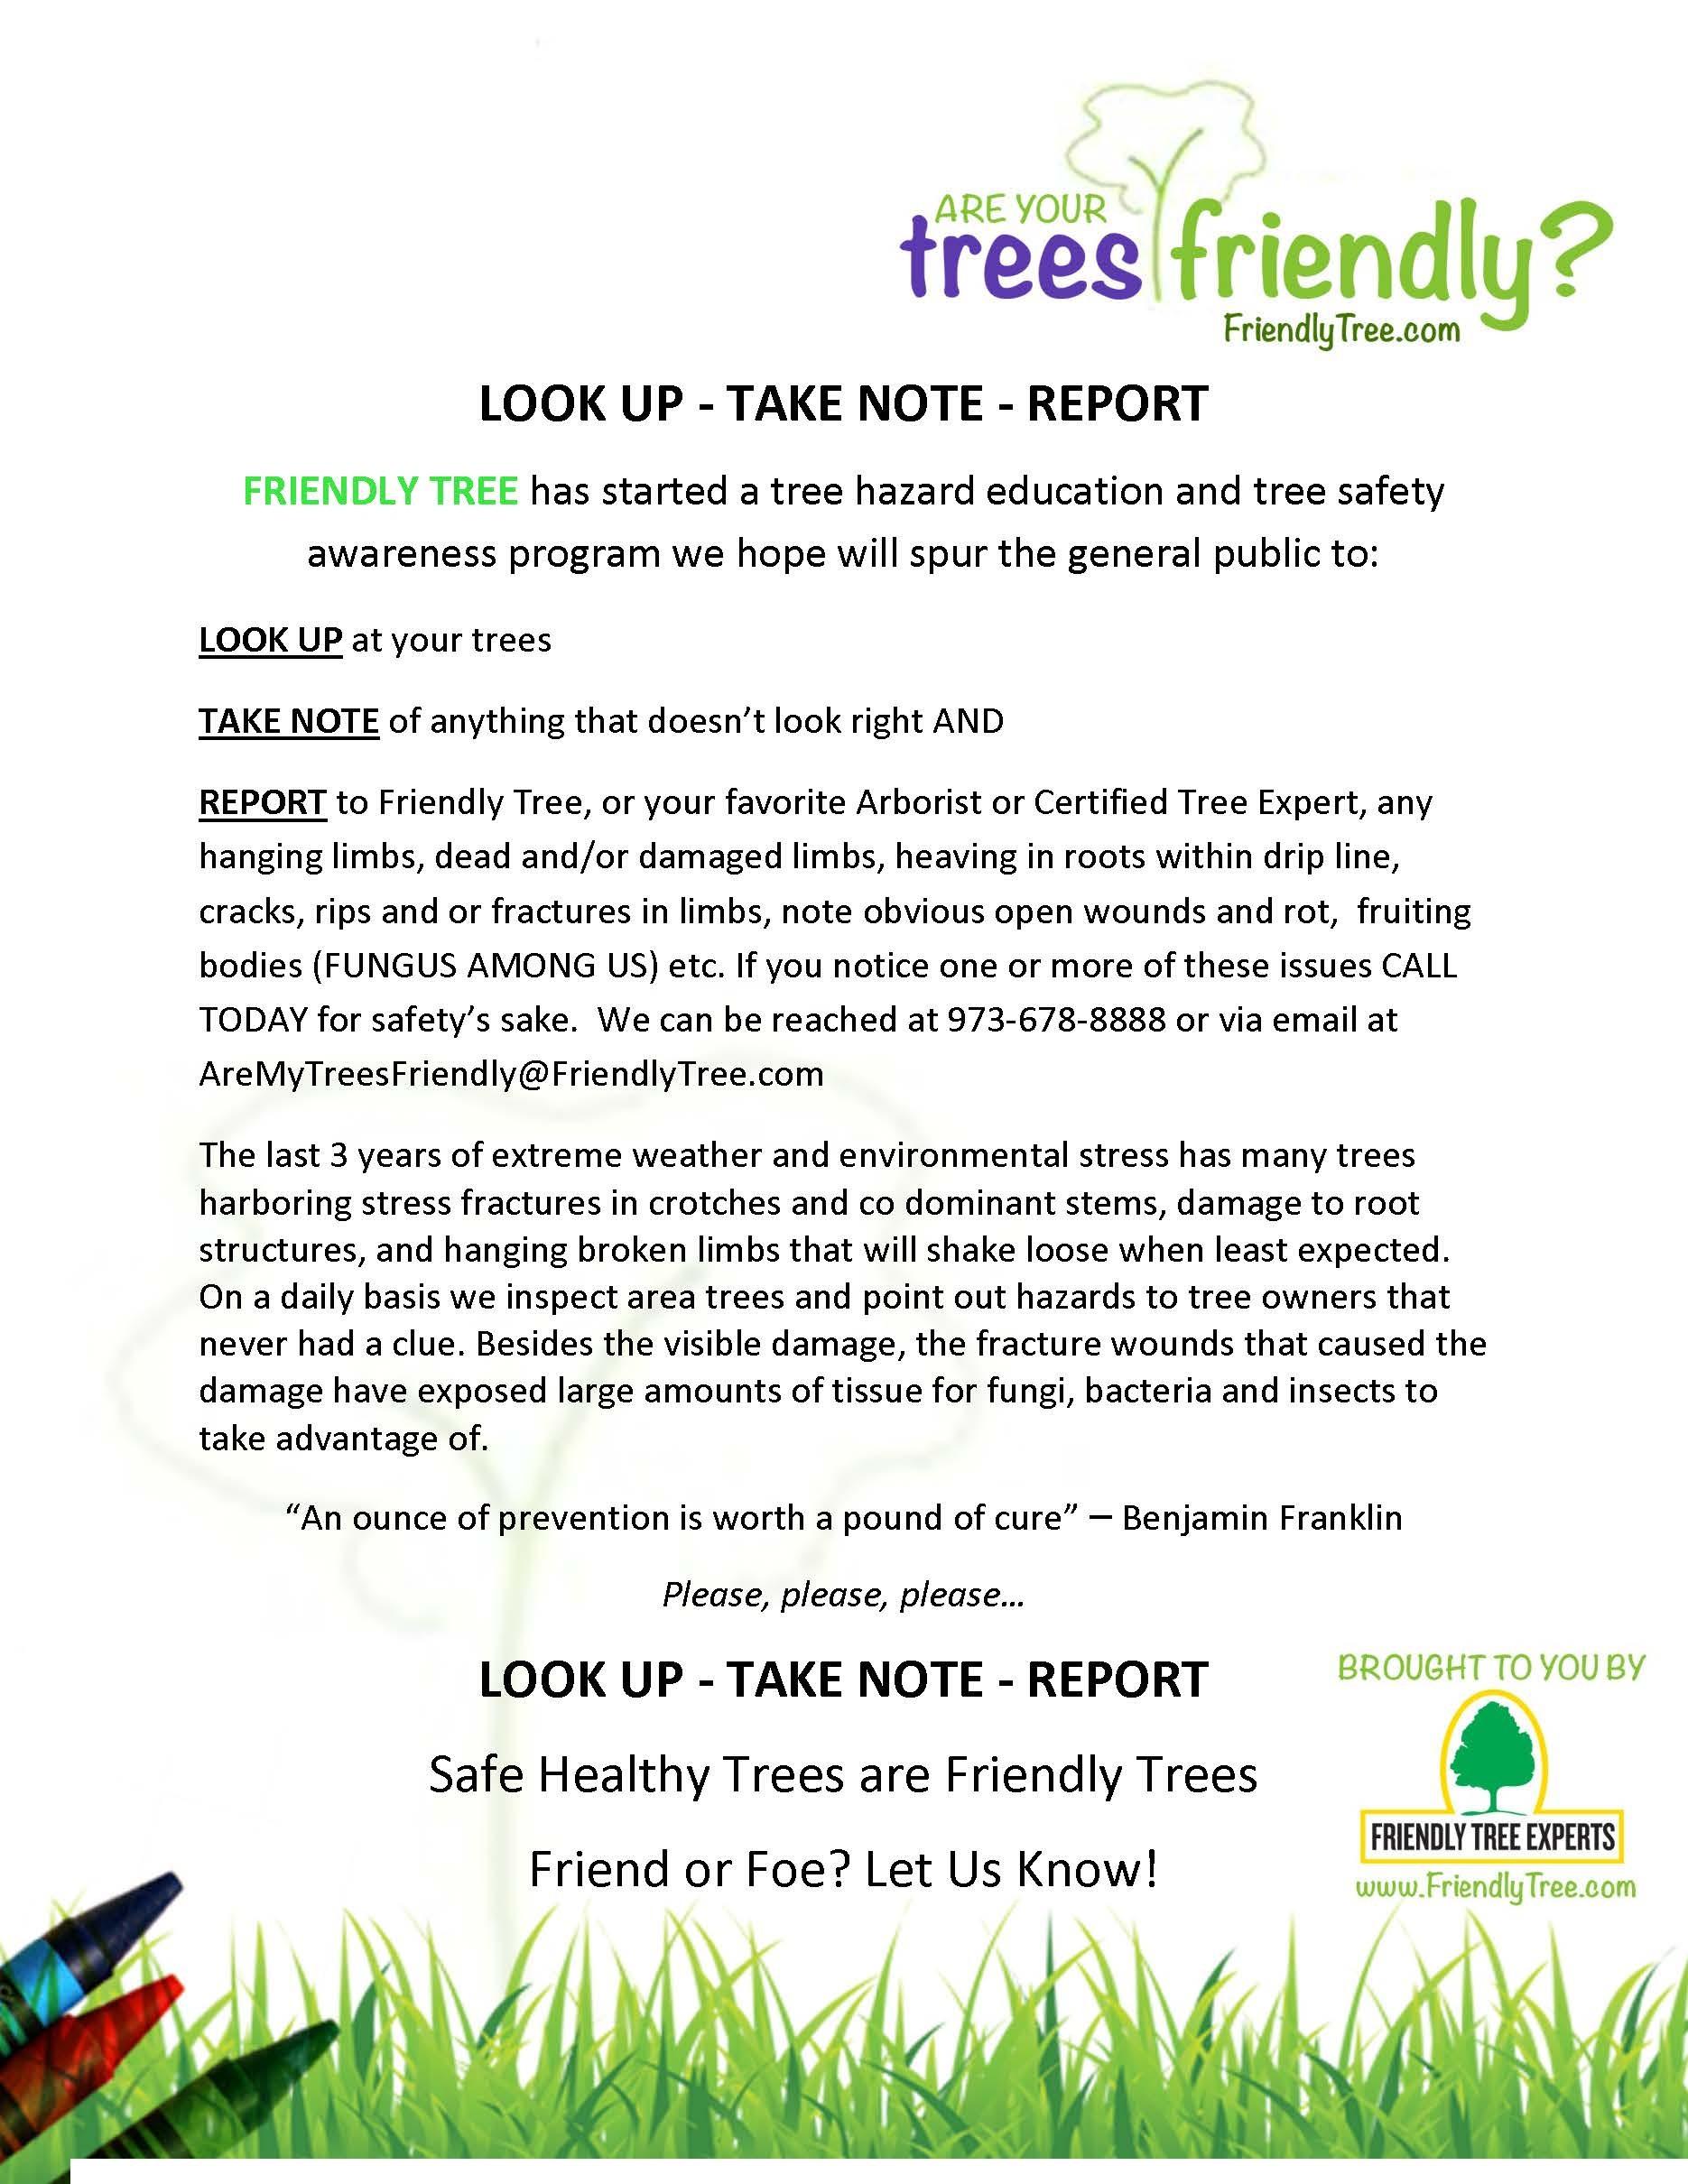 07bc8909e9f59e0368c7_Are_Your_Trees_Friendly_checklist_with_border___watermark_PIC_Page_1.jpg